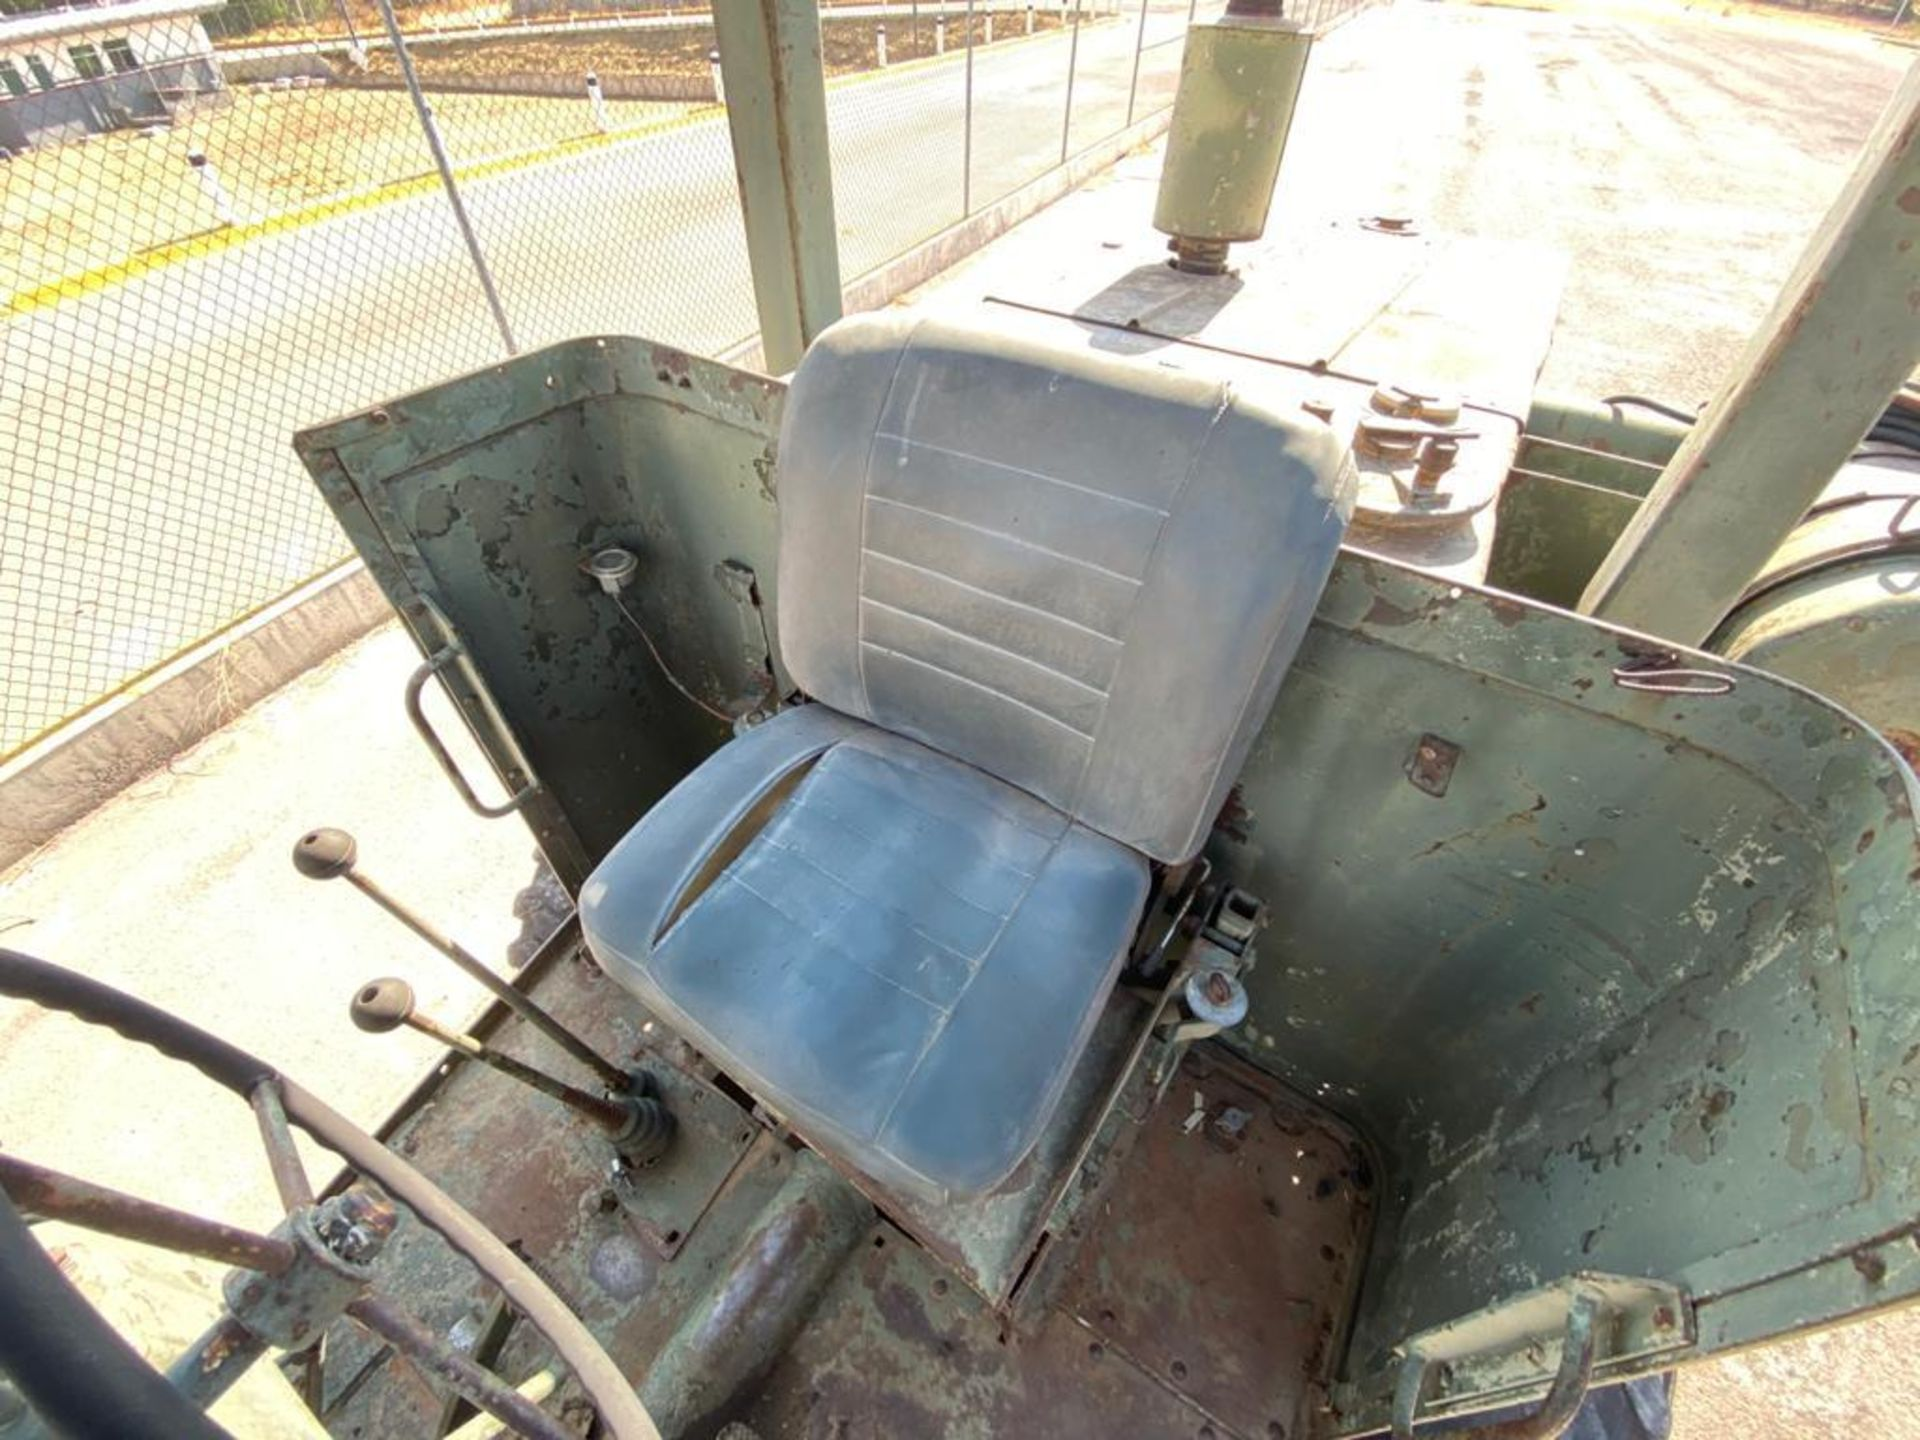 1970 Wabco4 440H Motor Grader, Serial number 440HAGM1398, Motor number 4A156316*RC*4057C - Image 42 of 77